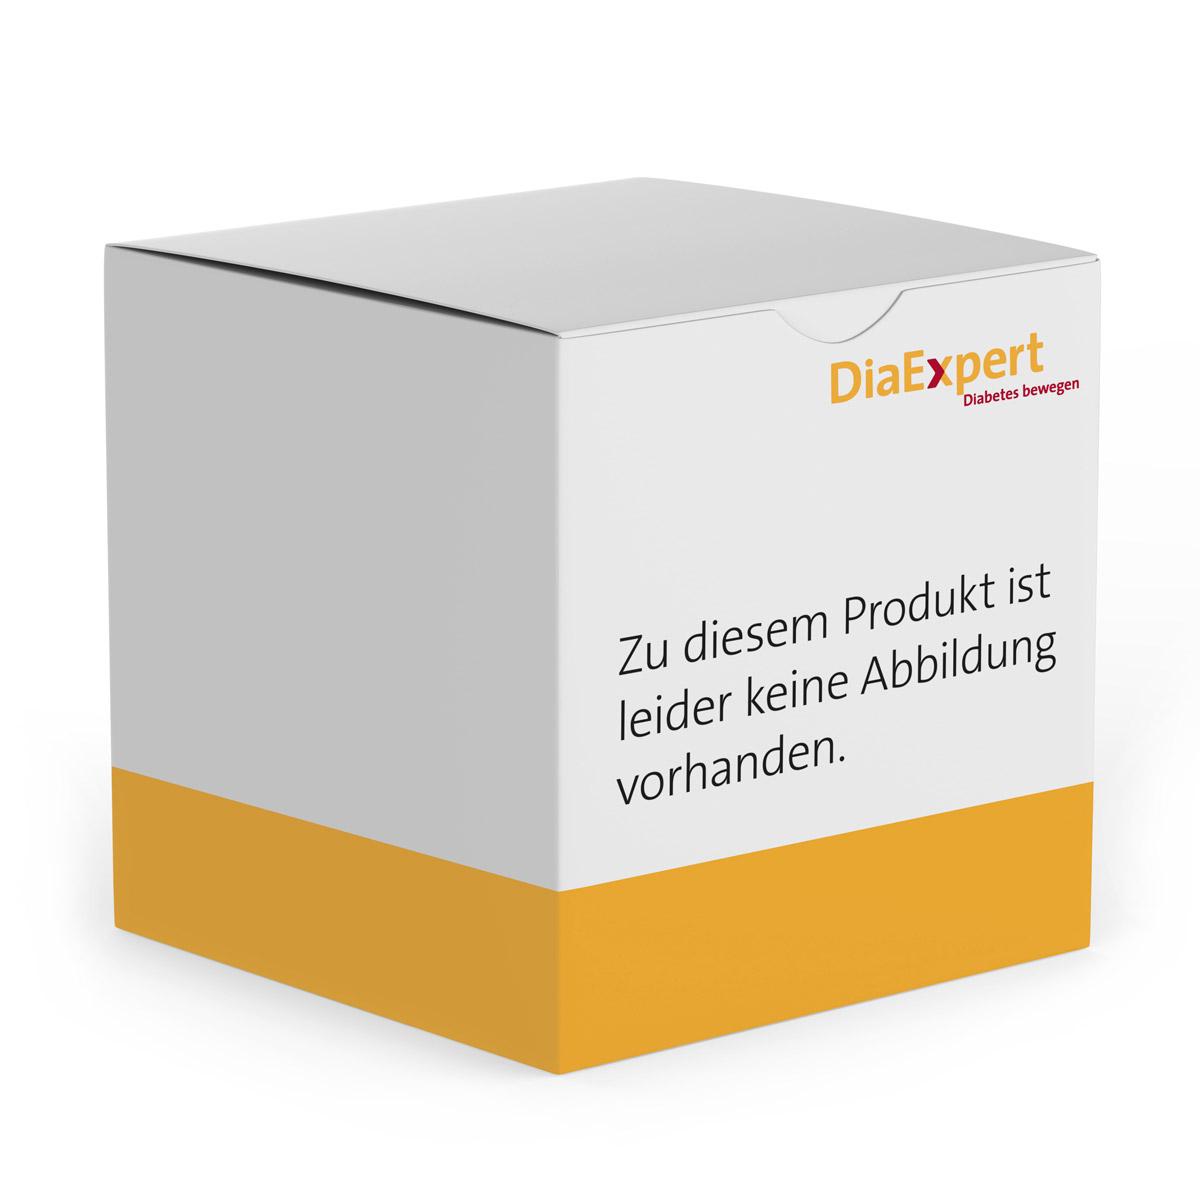 Diabetes-Kette Edelstahl Vitus 60 cm